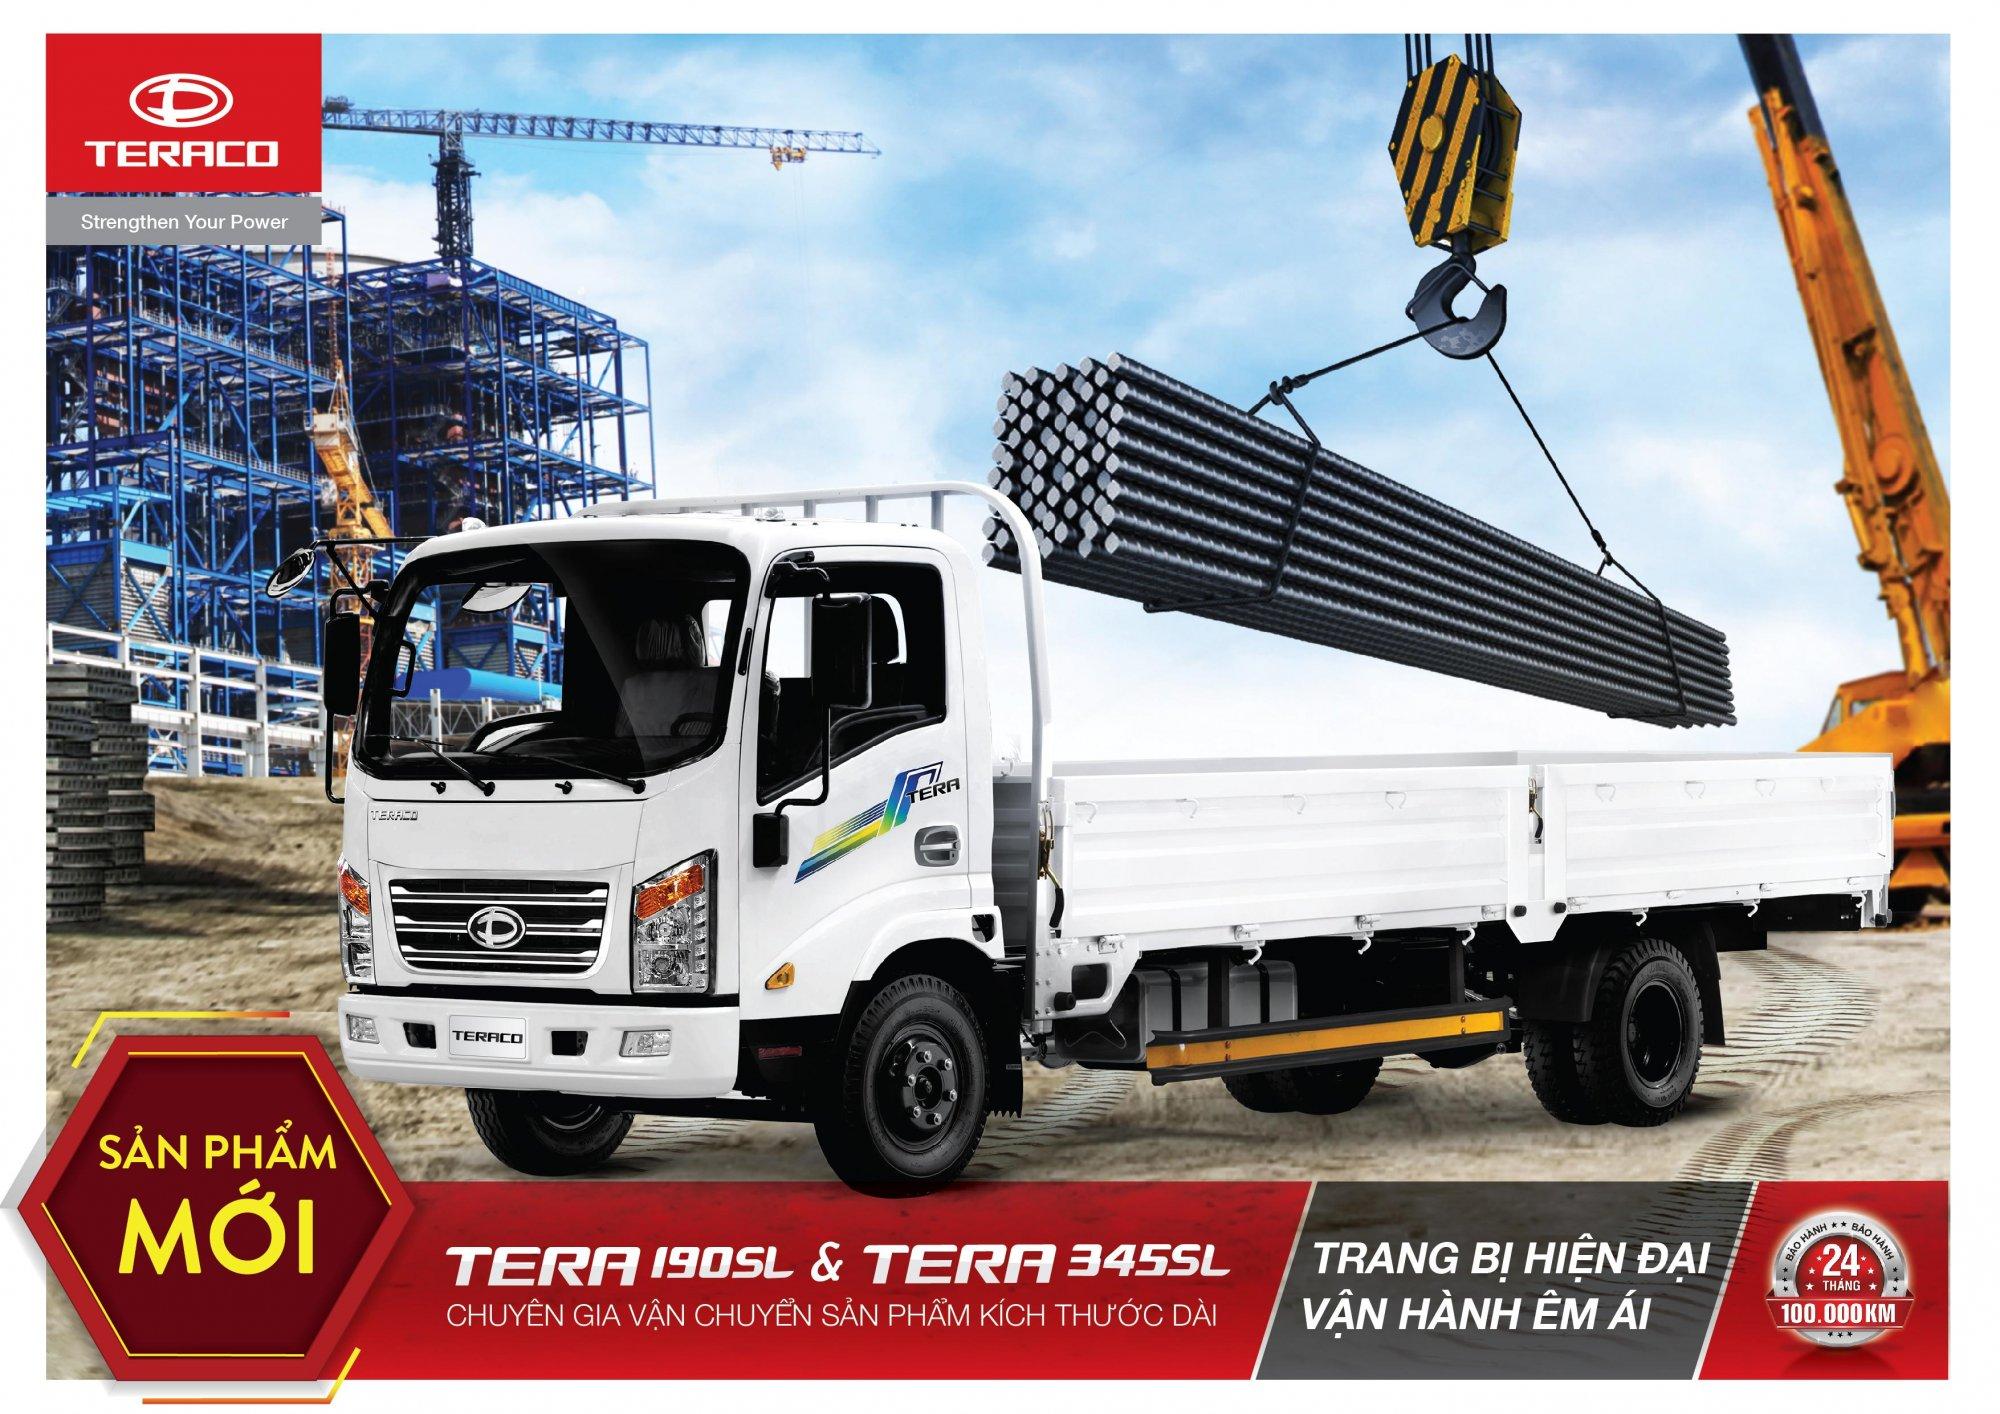 t190sl-t345sl-xe-tai-thung-dai-6m2 Tera190SL: TERA190SL